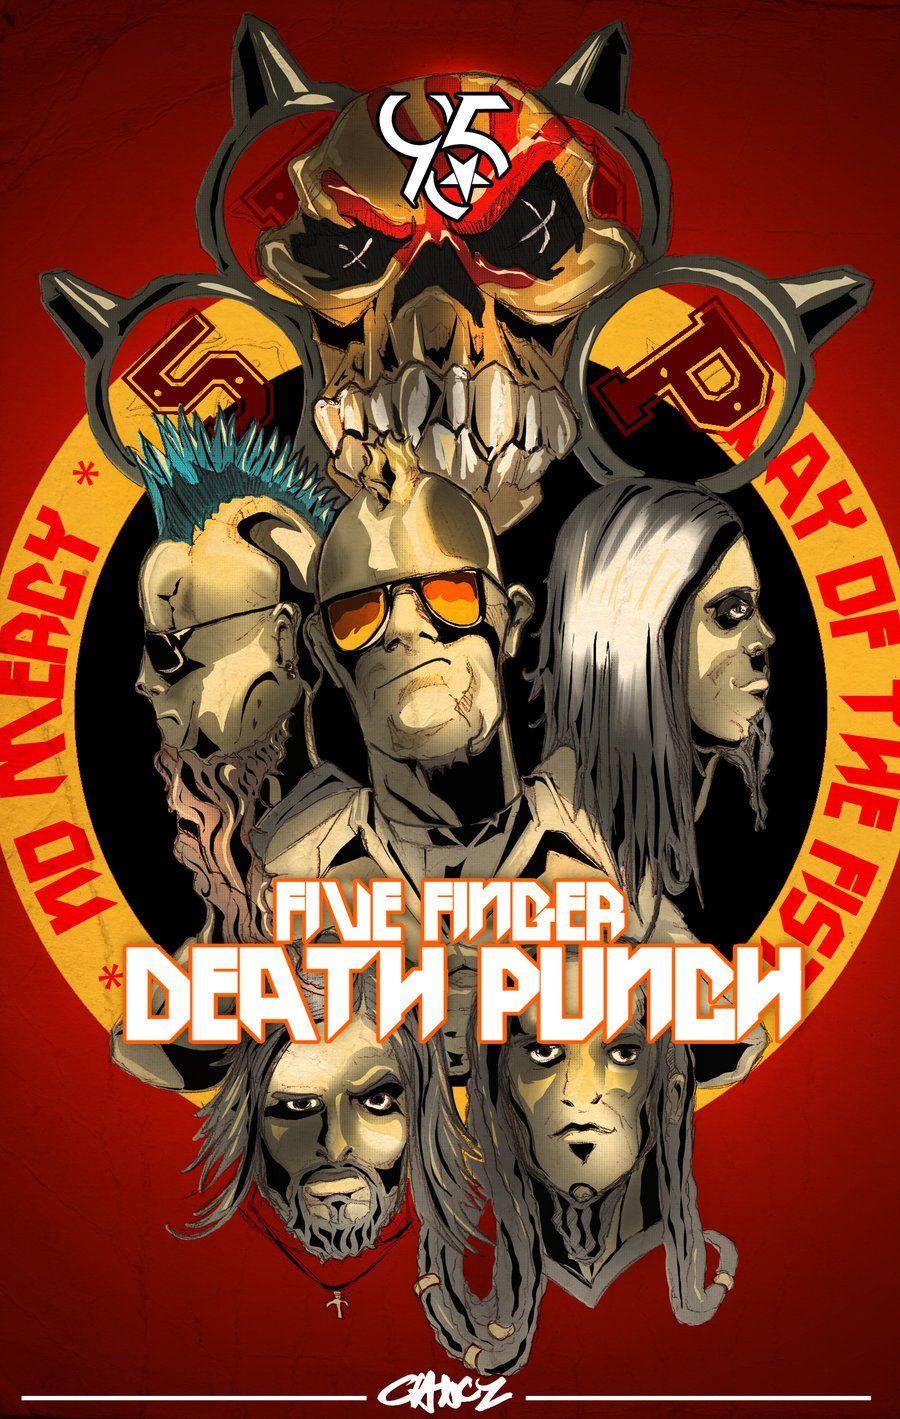 Epic 5fdp Knucklehead 5fdp In 2019 Five Fingers Death Bmth